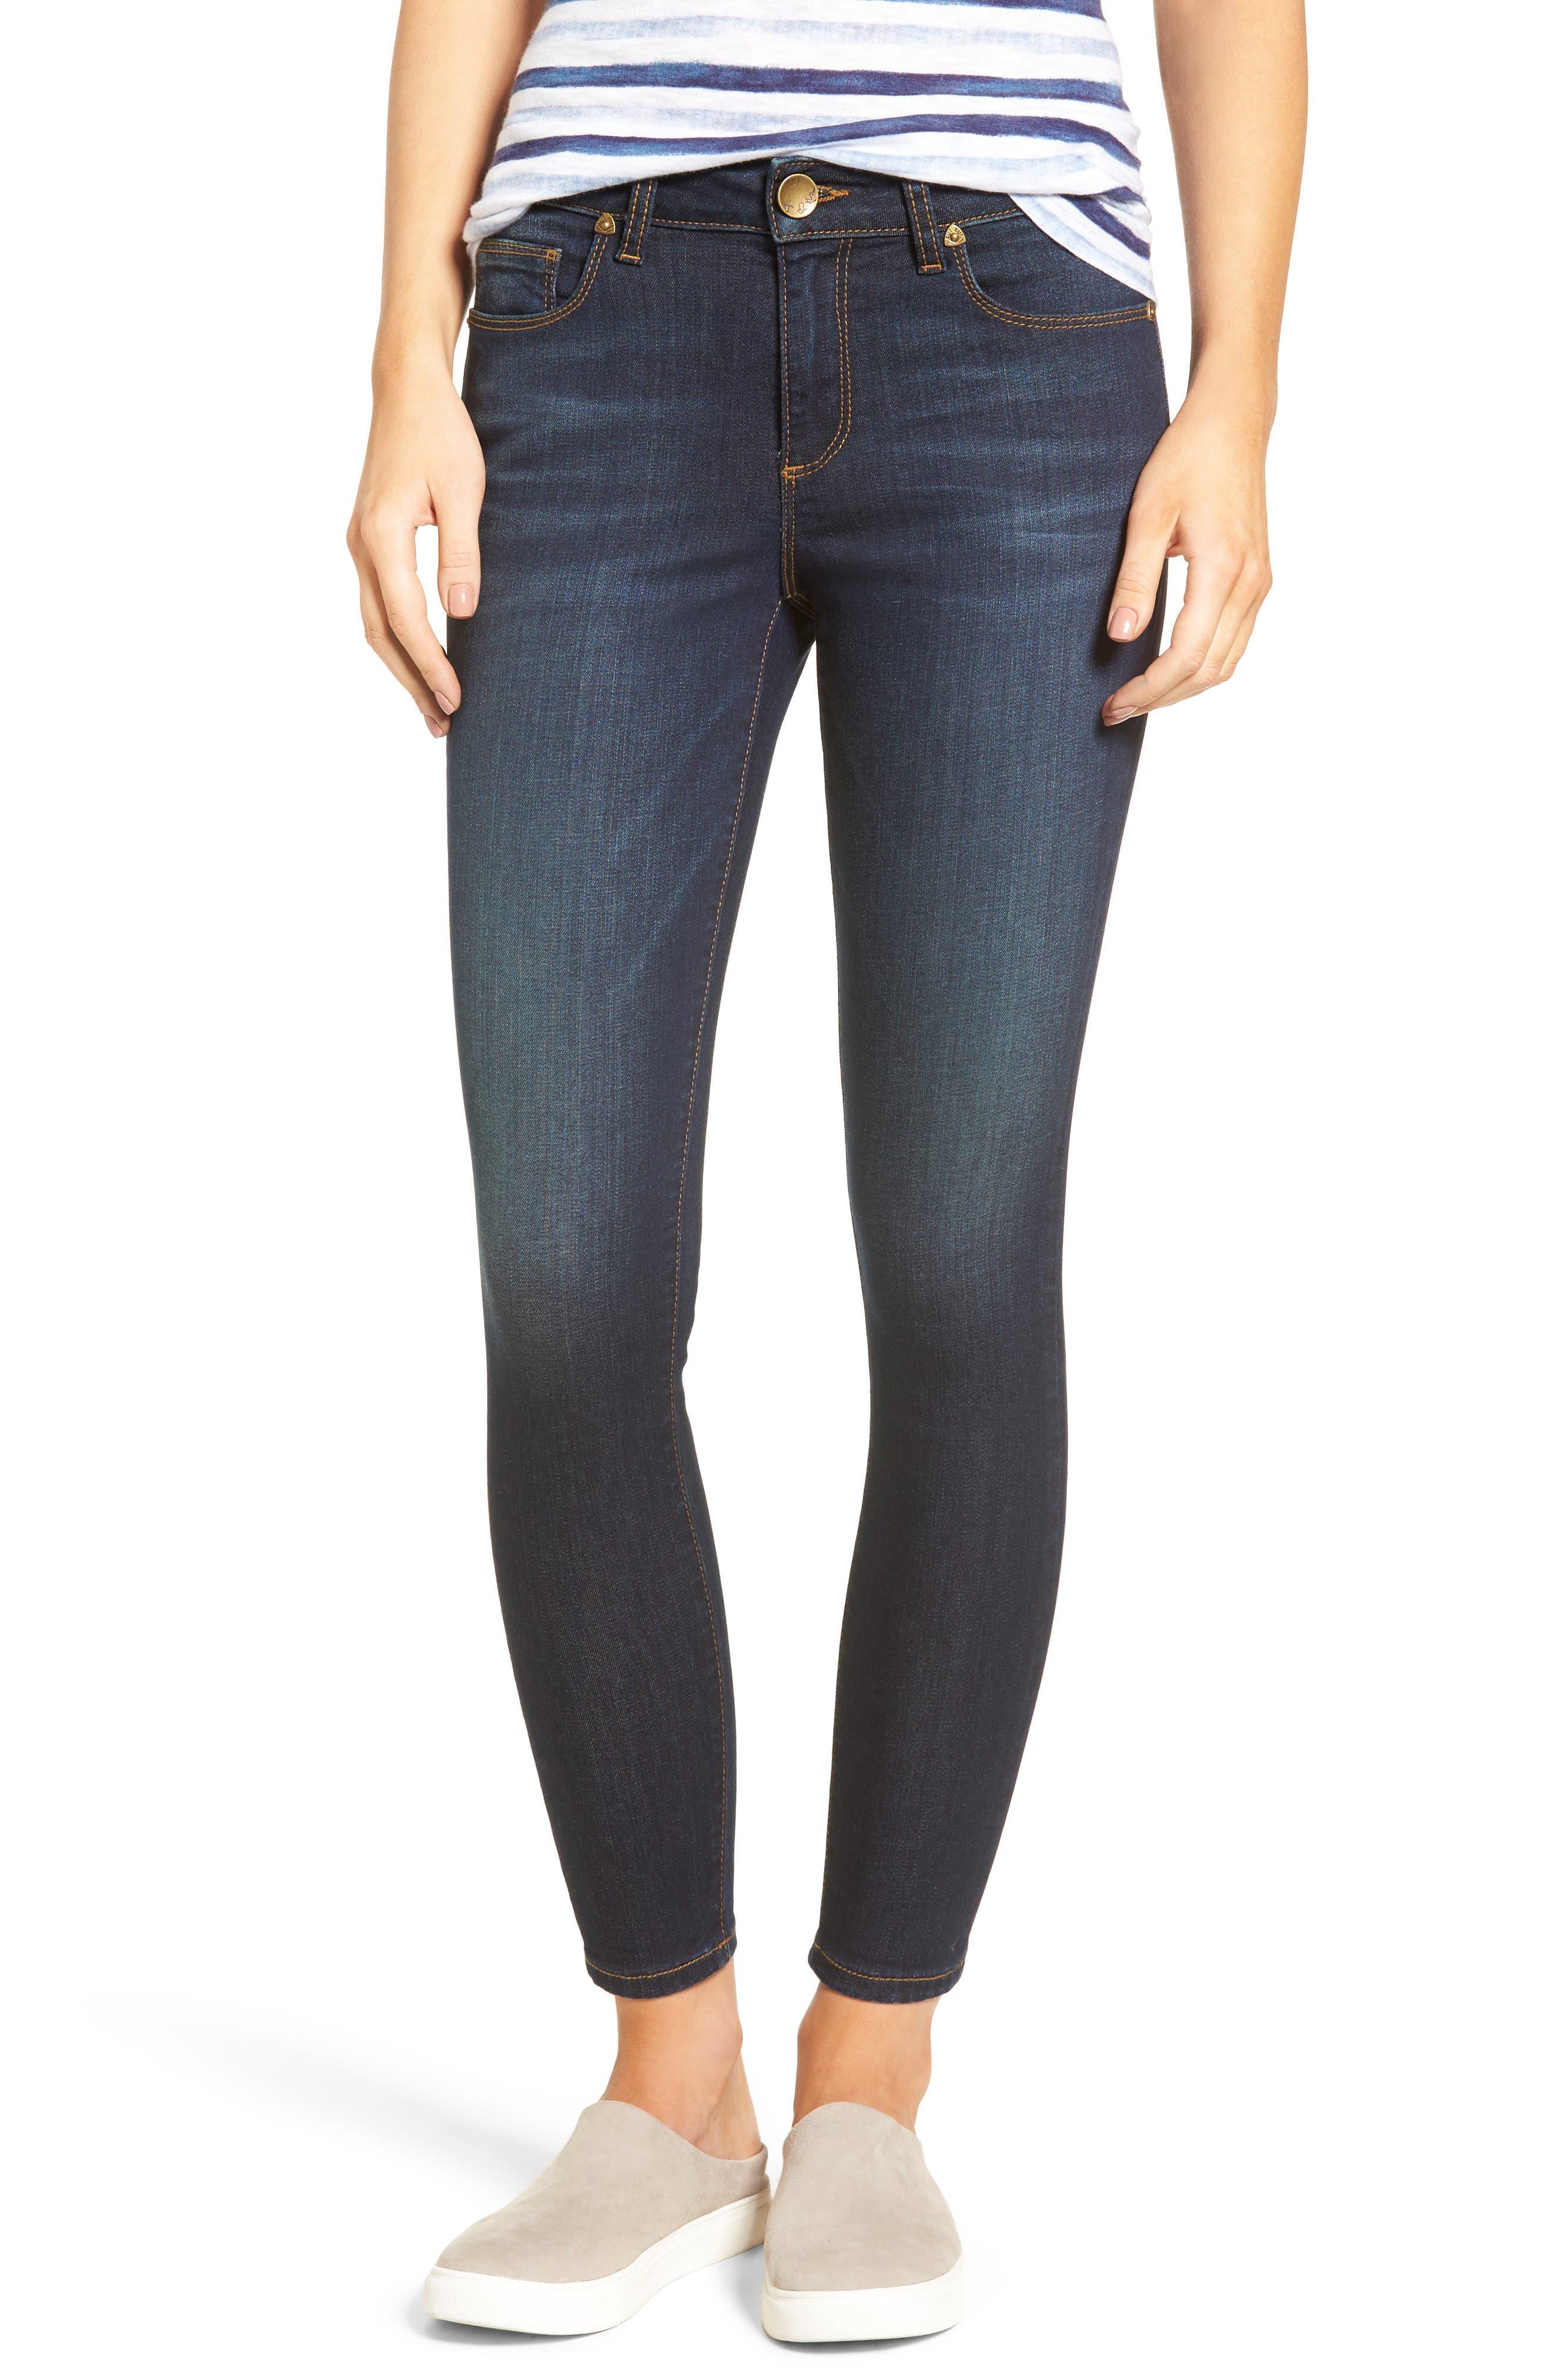 Main Image - KUT from the Kloth Kurvy Ankle Skinny Jeans (Blinding)